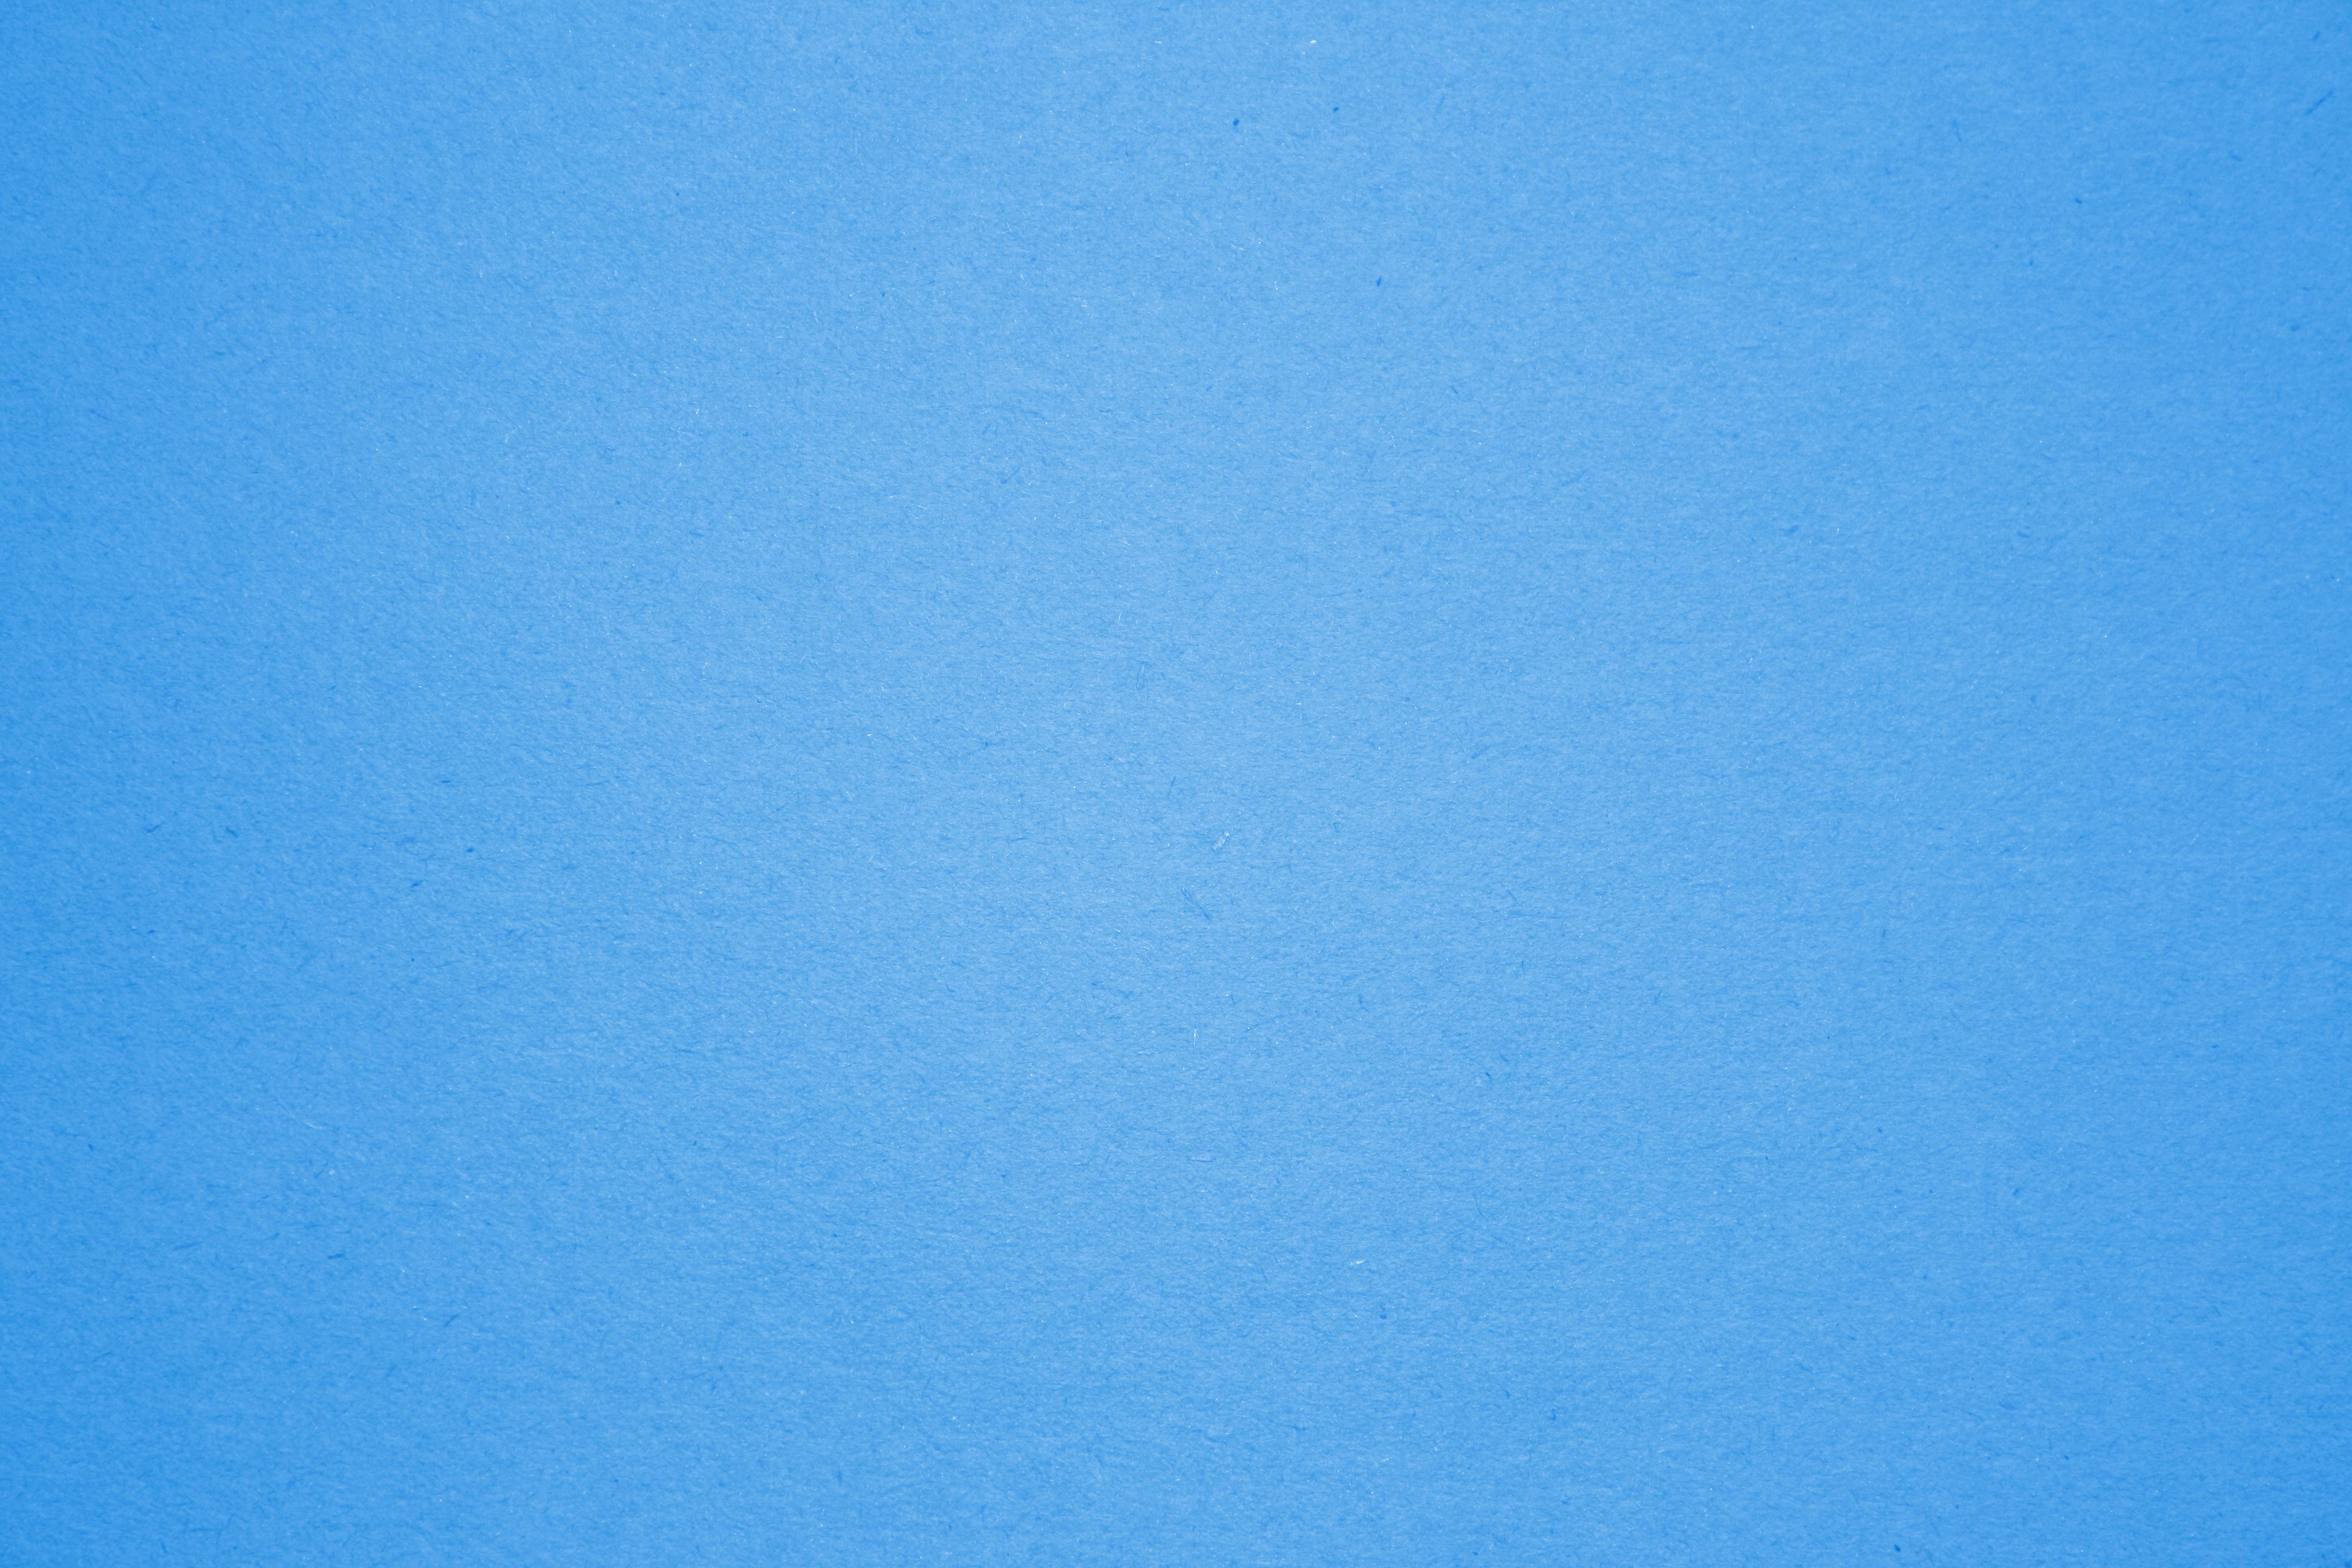 Light Blue Construction Paper Texture   High Resolution Photo 3888x2592